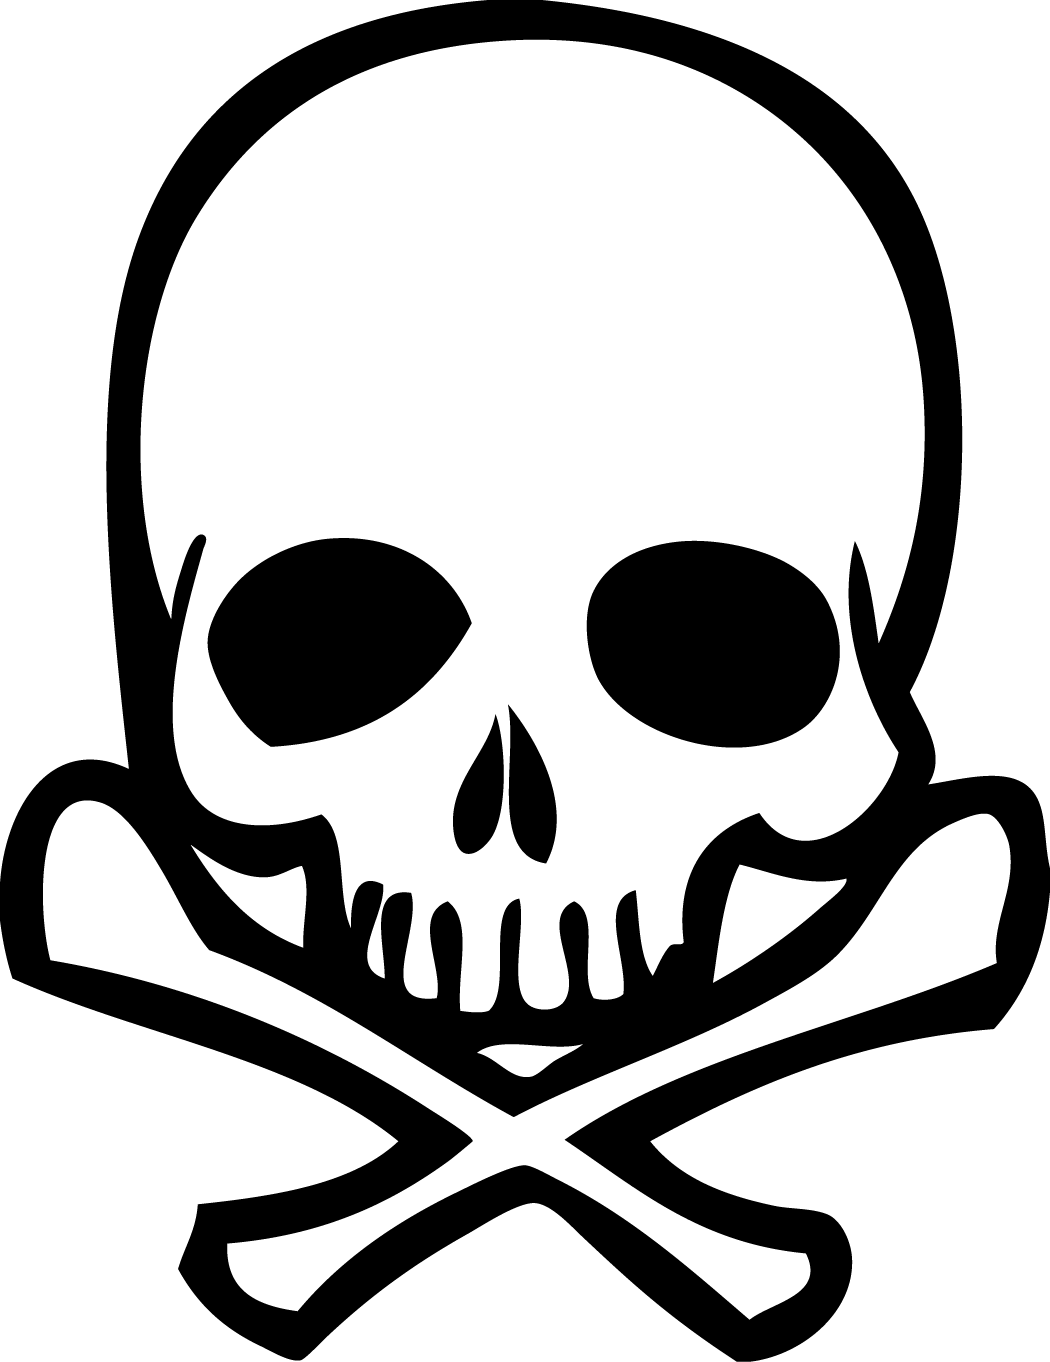 Clipart Skull And Bones - .-Clipart skull and bones - .-1